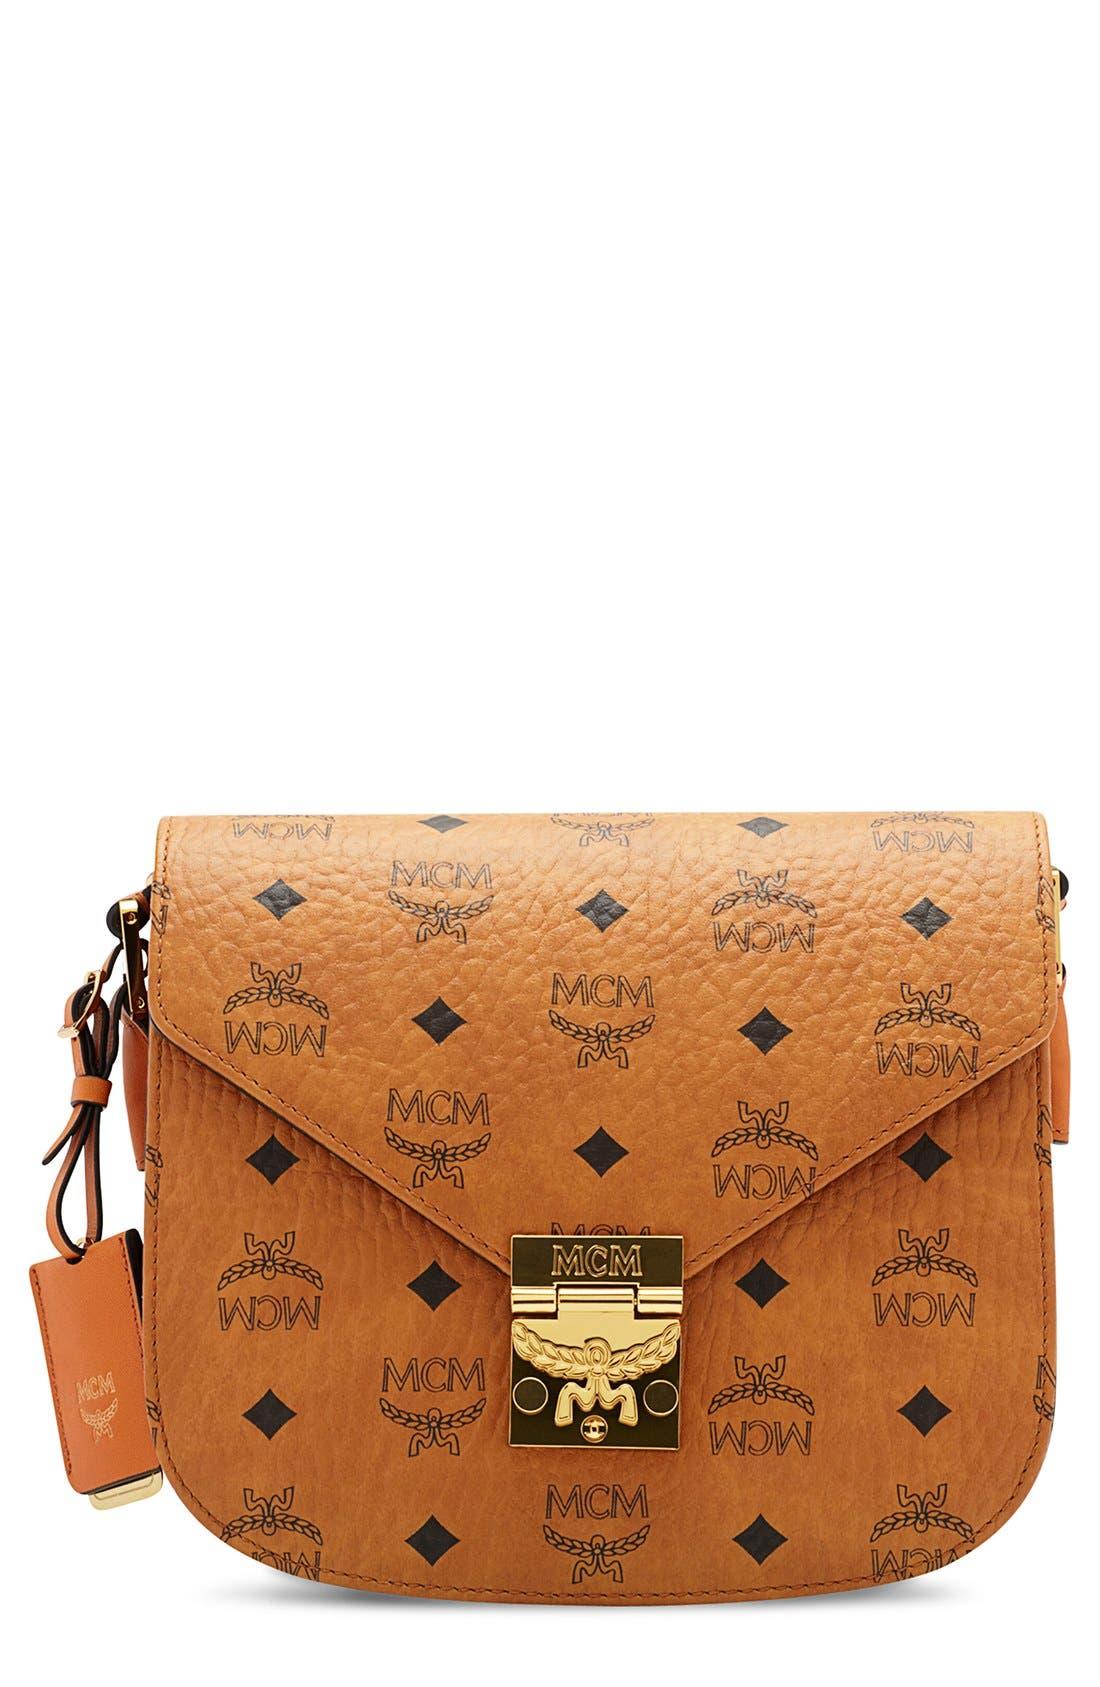 Main Image - MCM 'Small Patricia' Visetos Coated Canvas Crossbody Bag